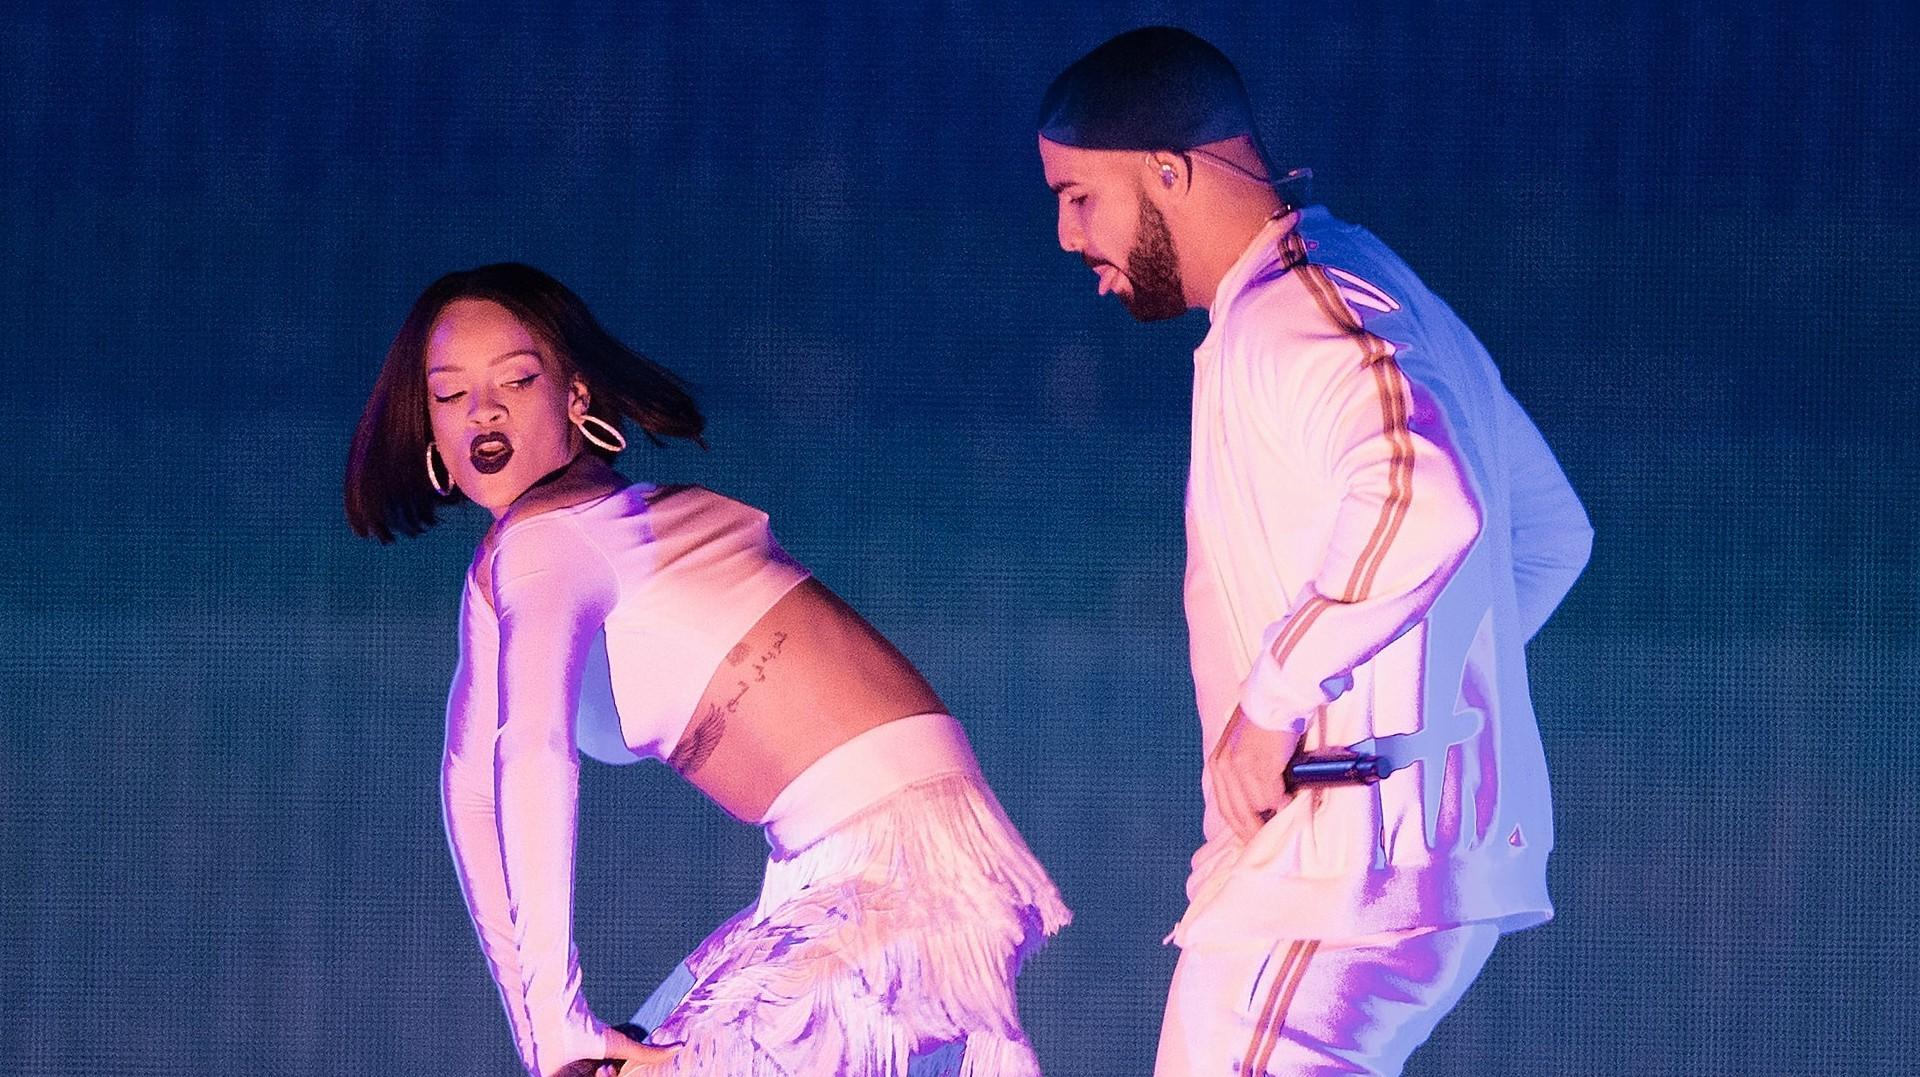 Rihanna dating drake